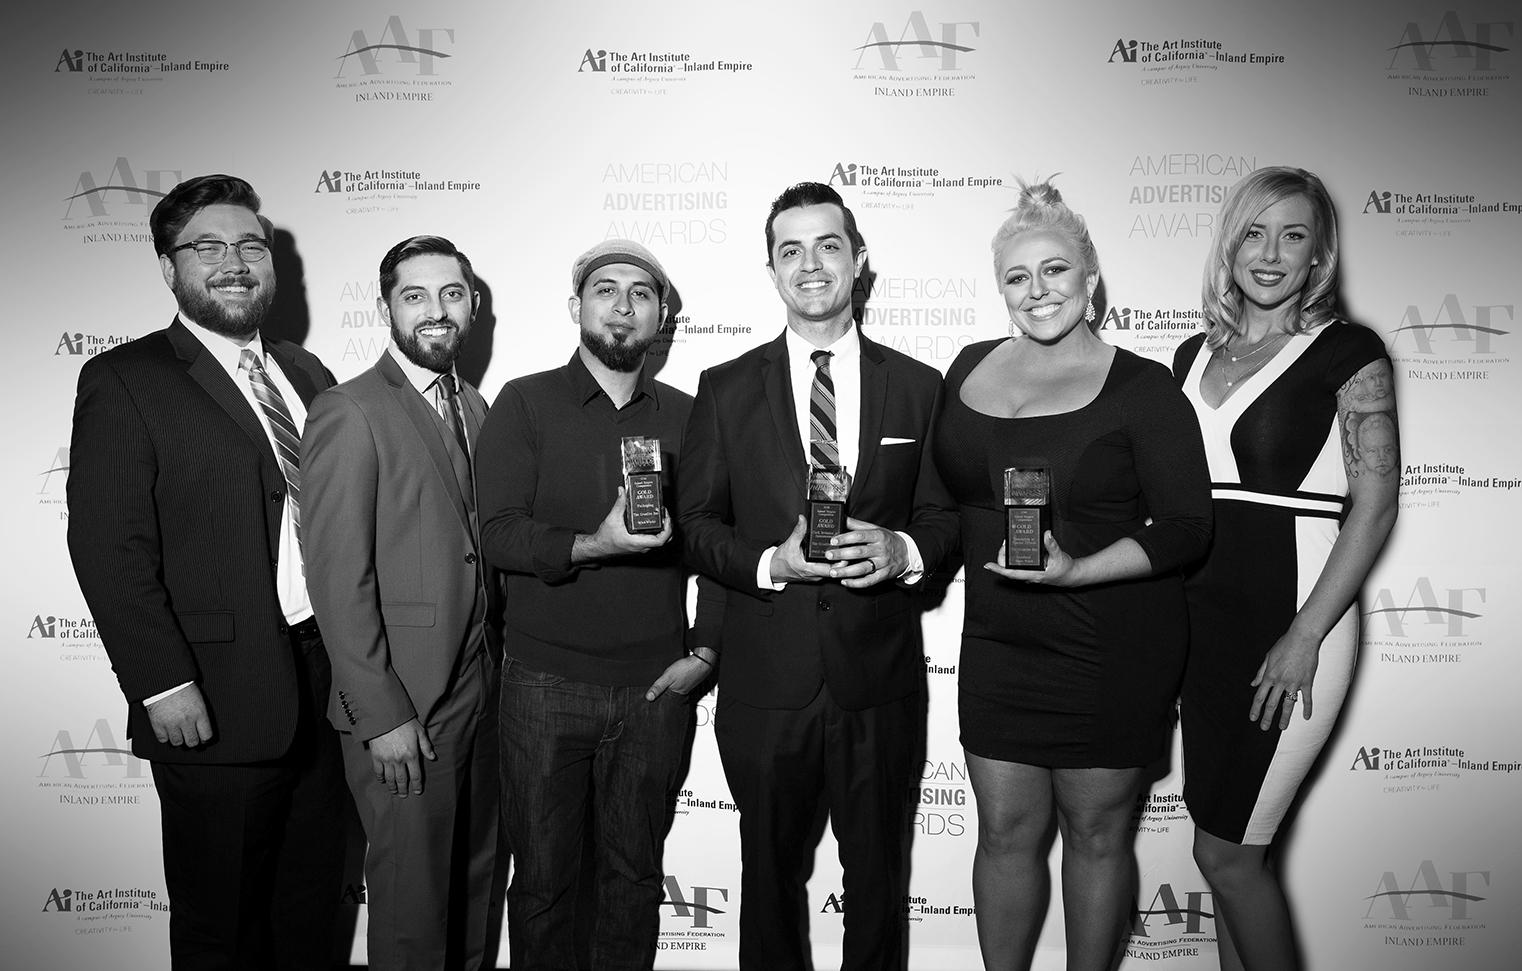 Award winning designers